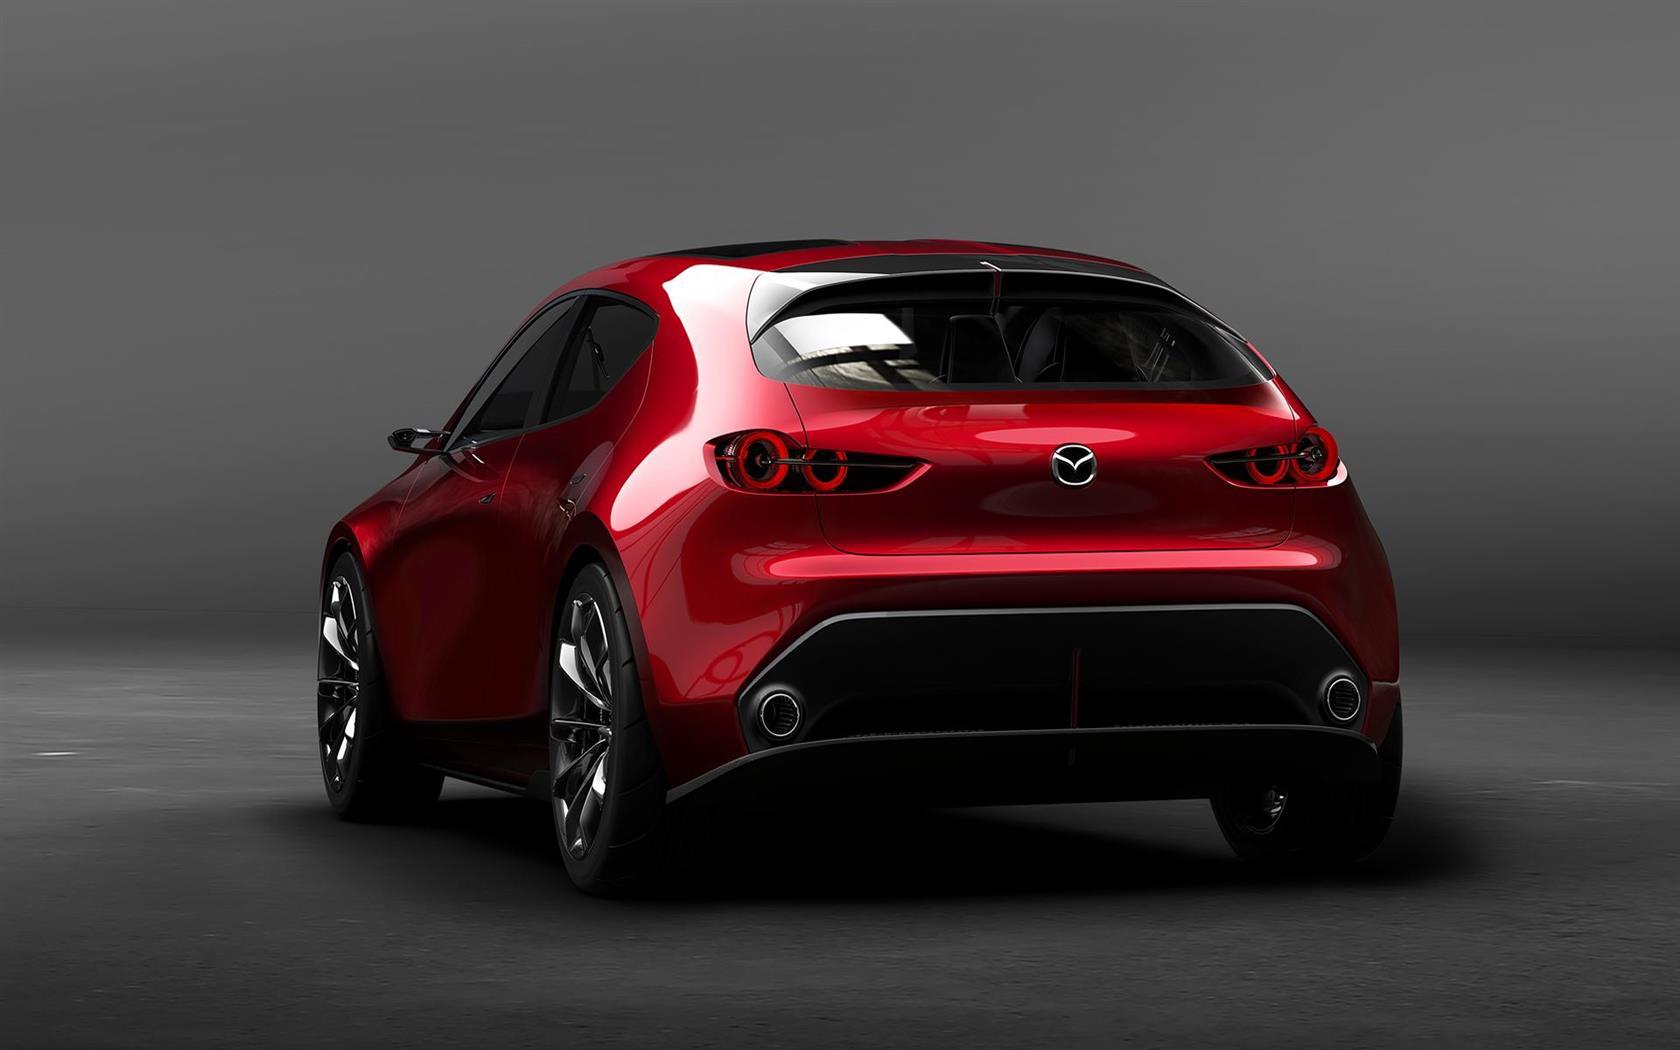 https://www.conceptcarz.com/images/Mazda/Mazda-Kai-Concept-image-07-1680.jpg